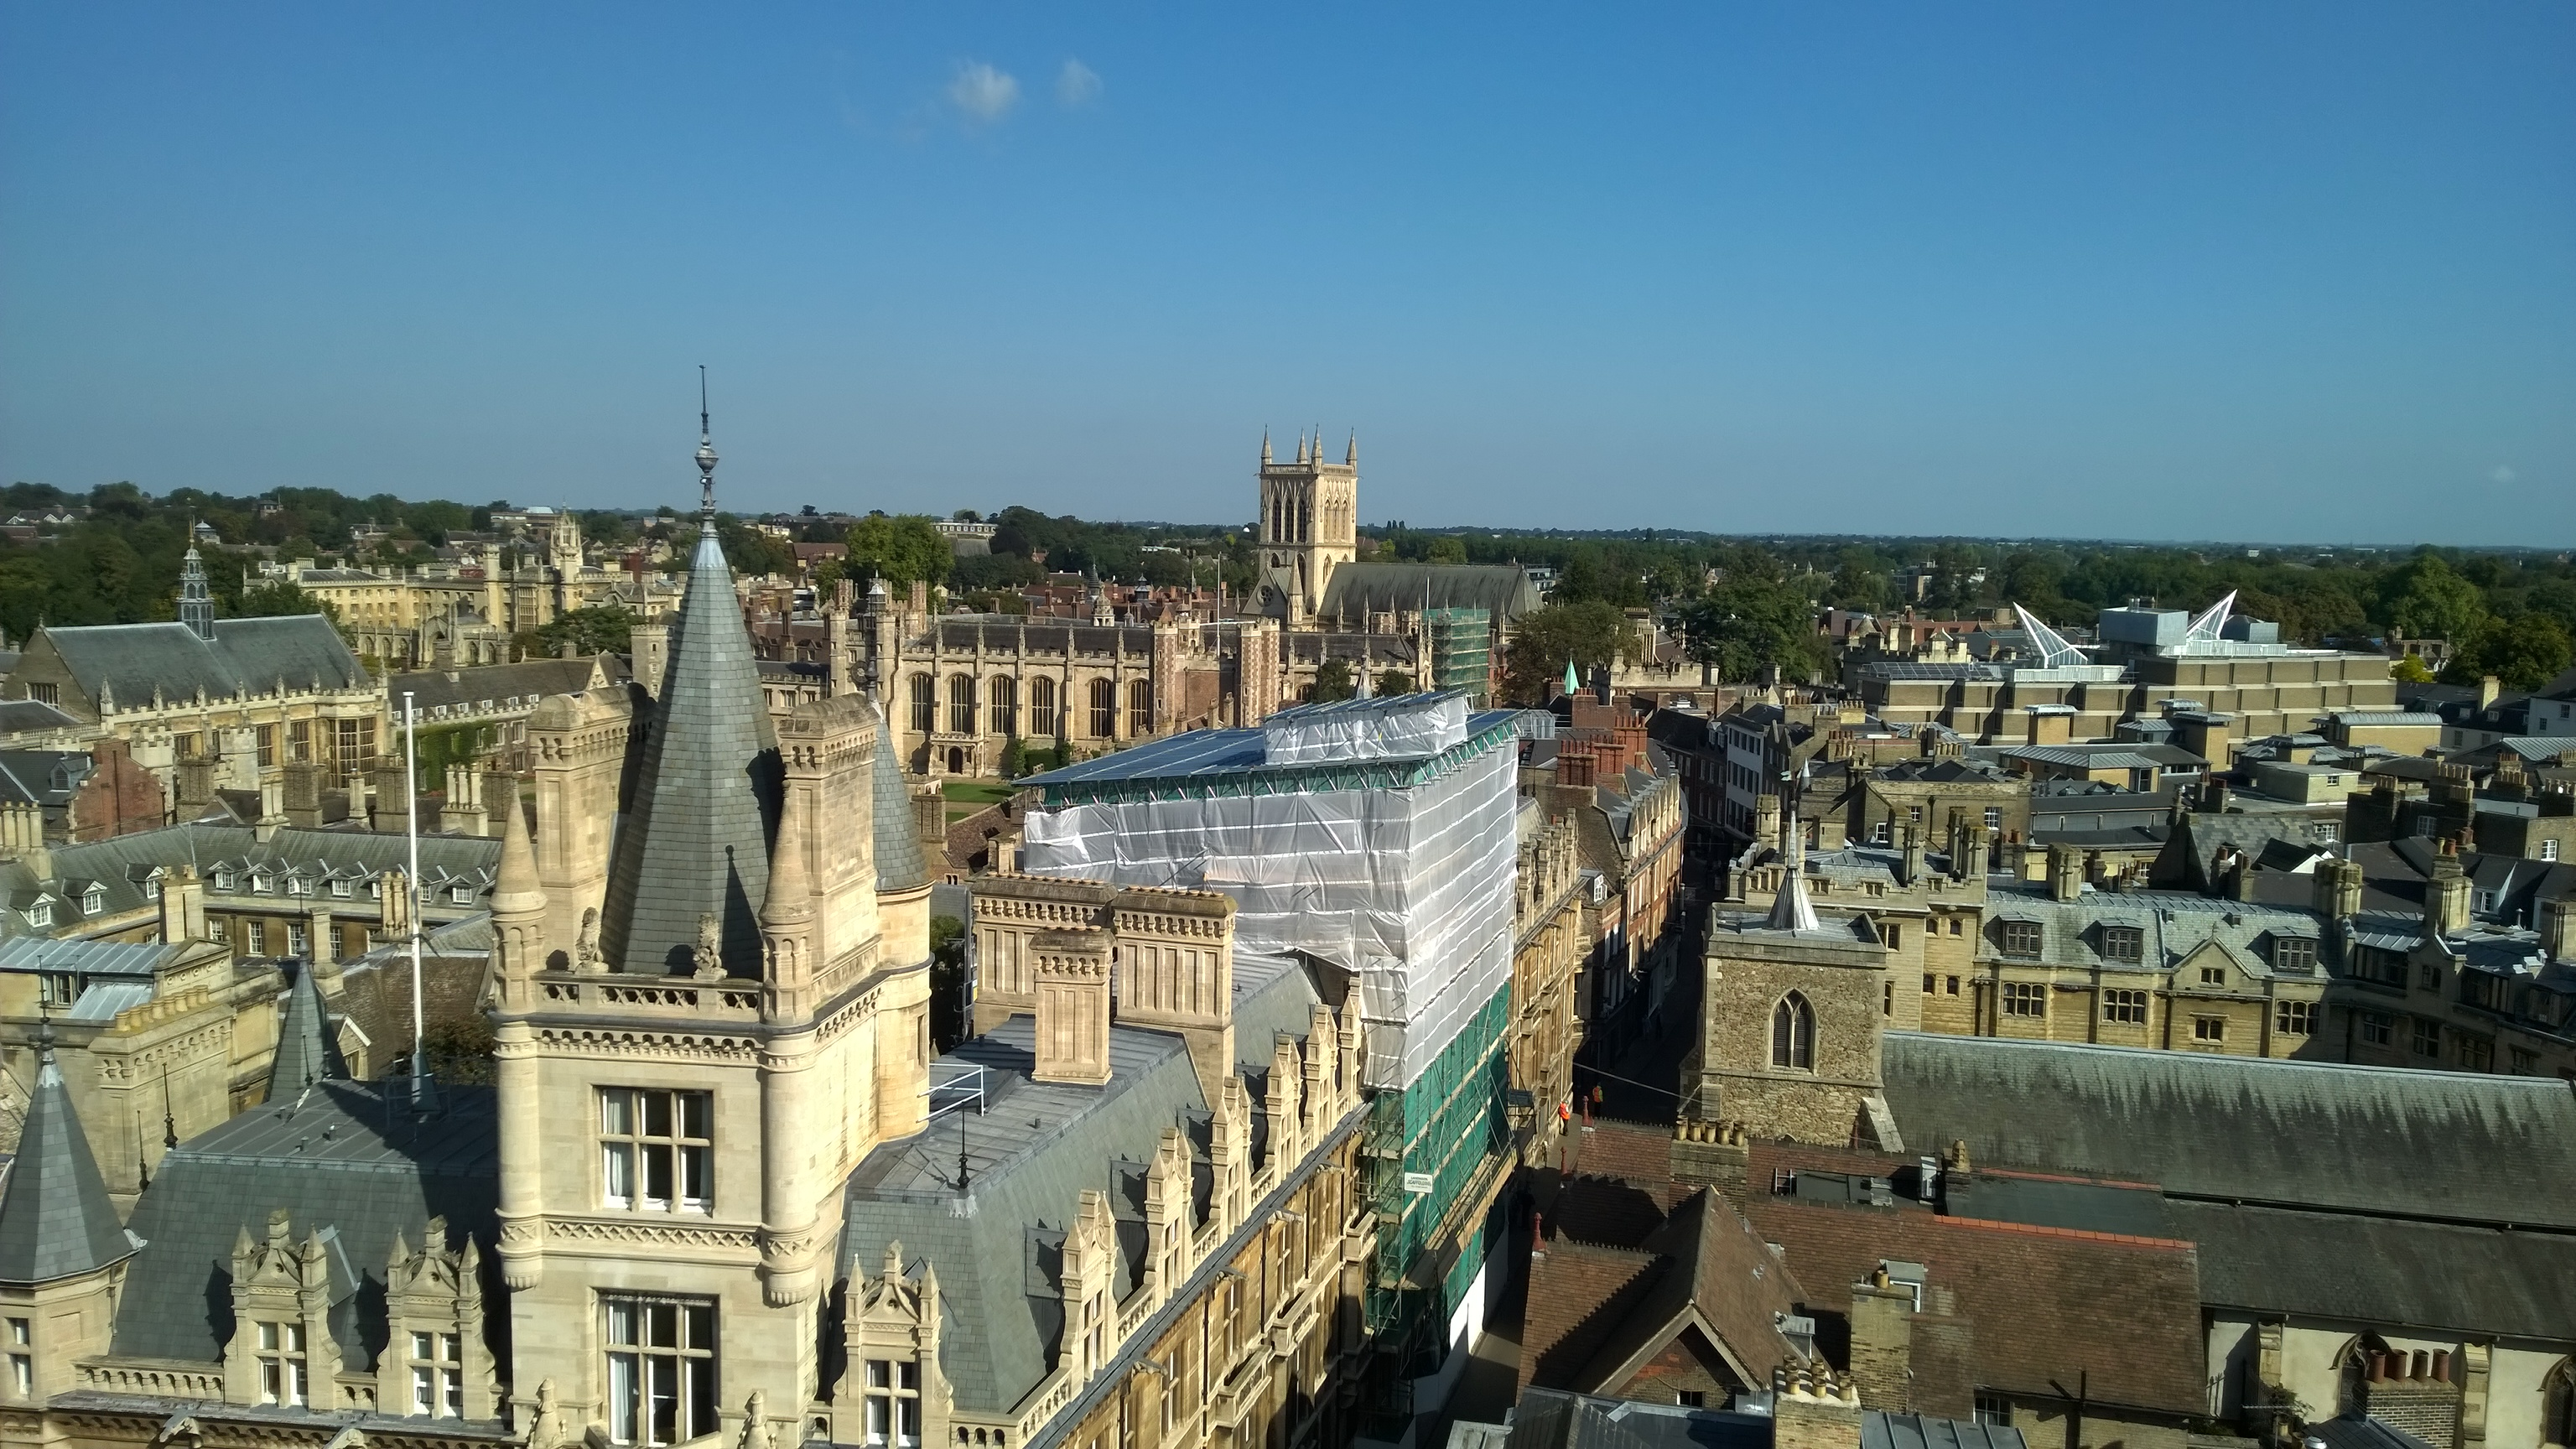 View in Cambridge